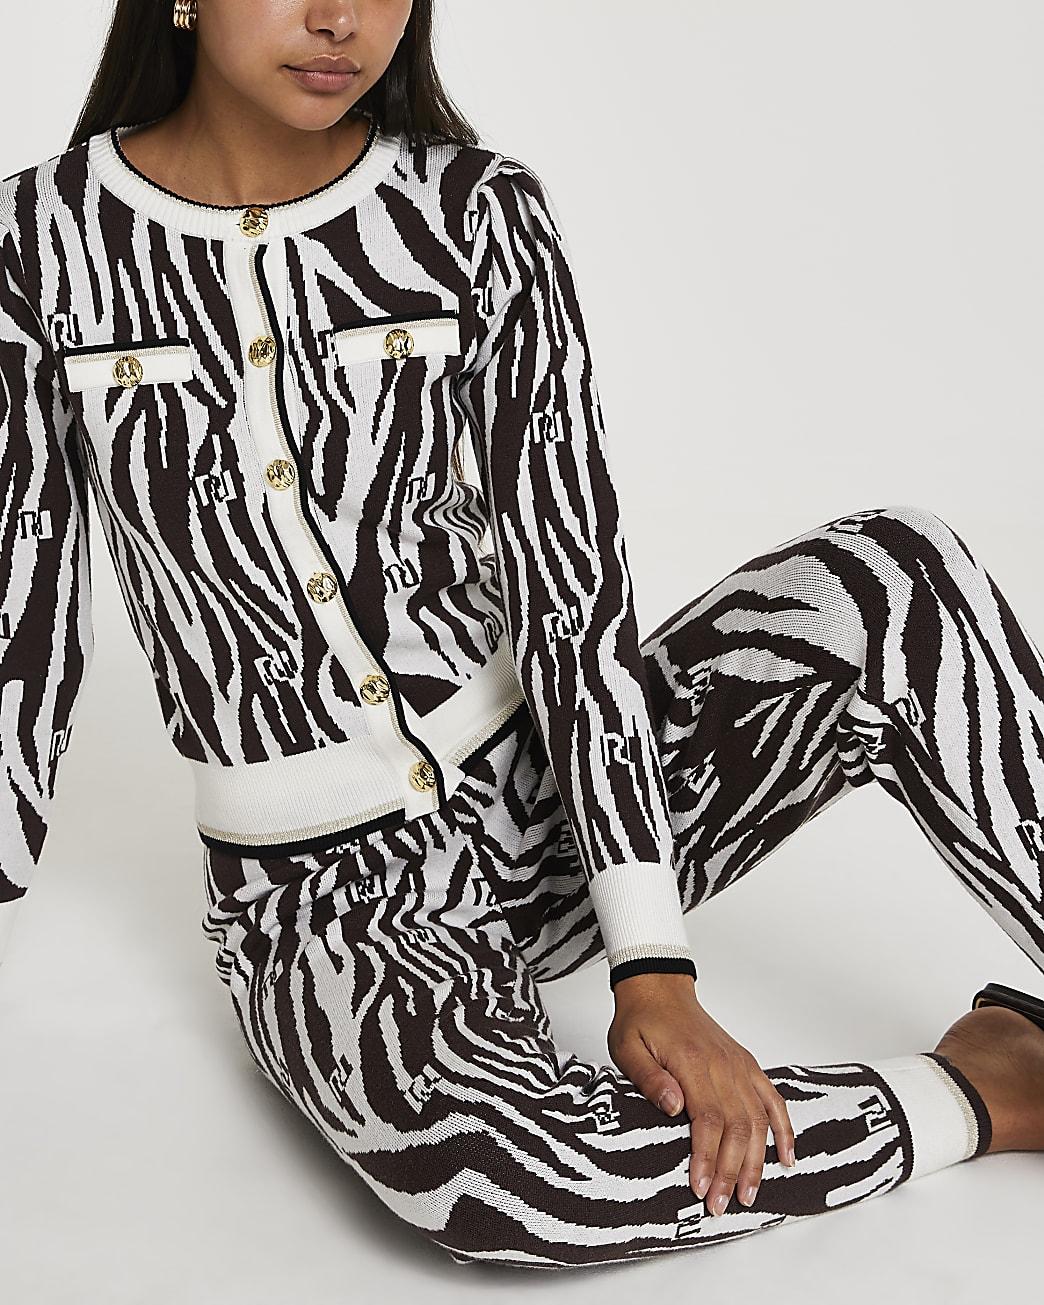 Brown RI zebra print fitted cardigan